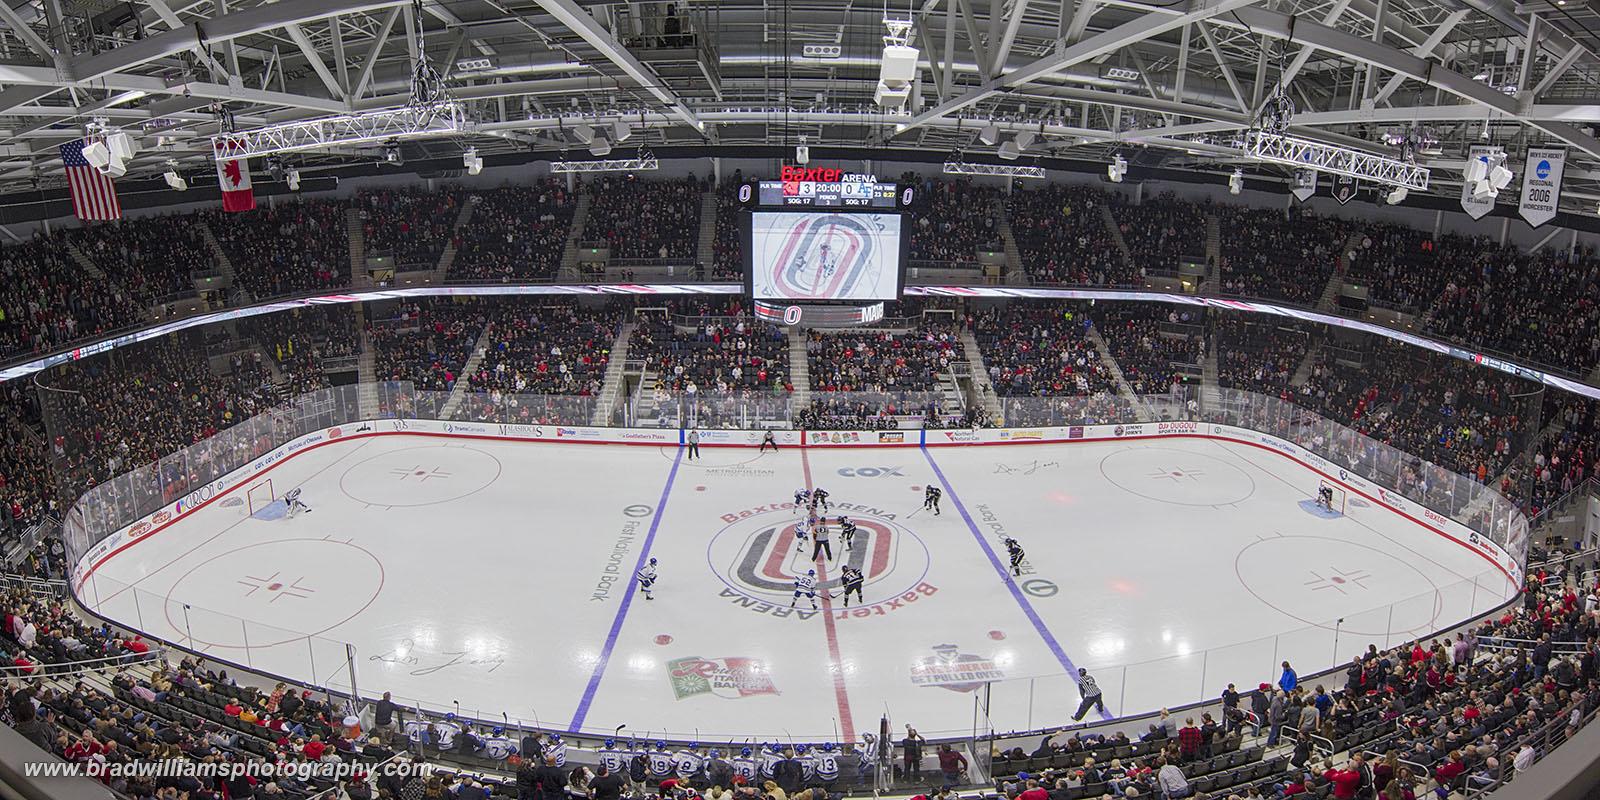 baxter, arena, omaha, nebraska, opening night, uno, maverick, hockey, , photo